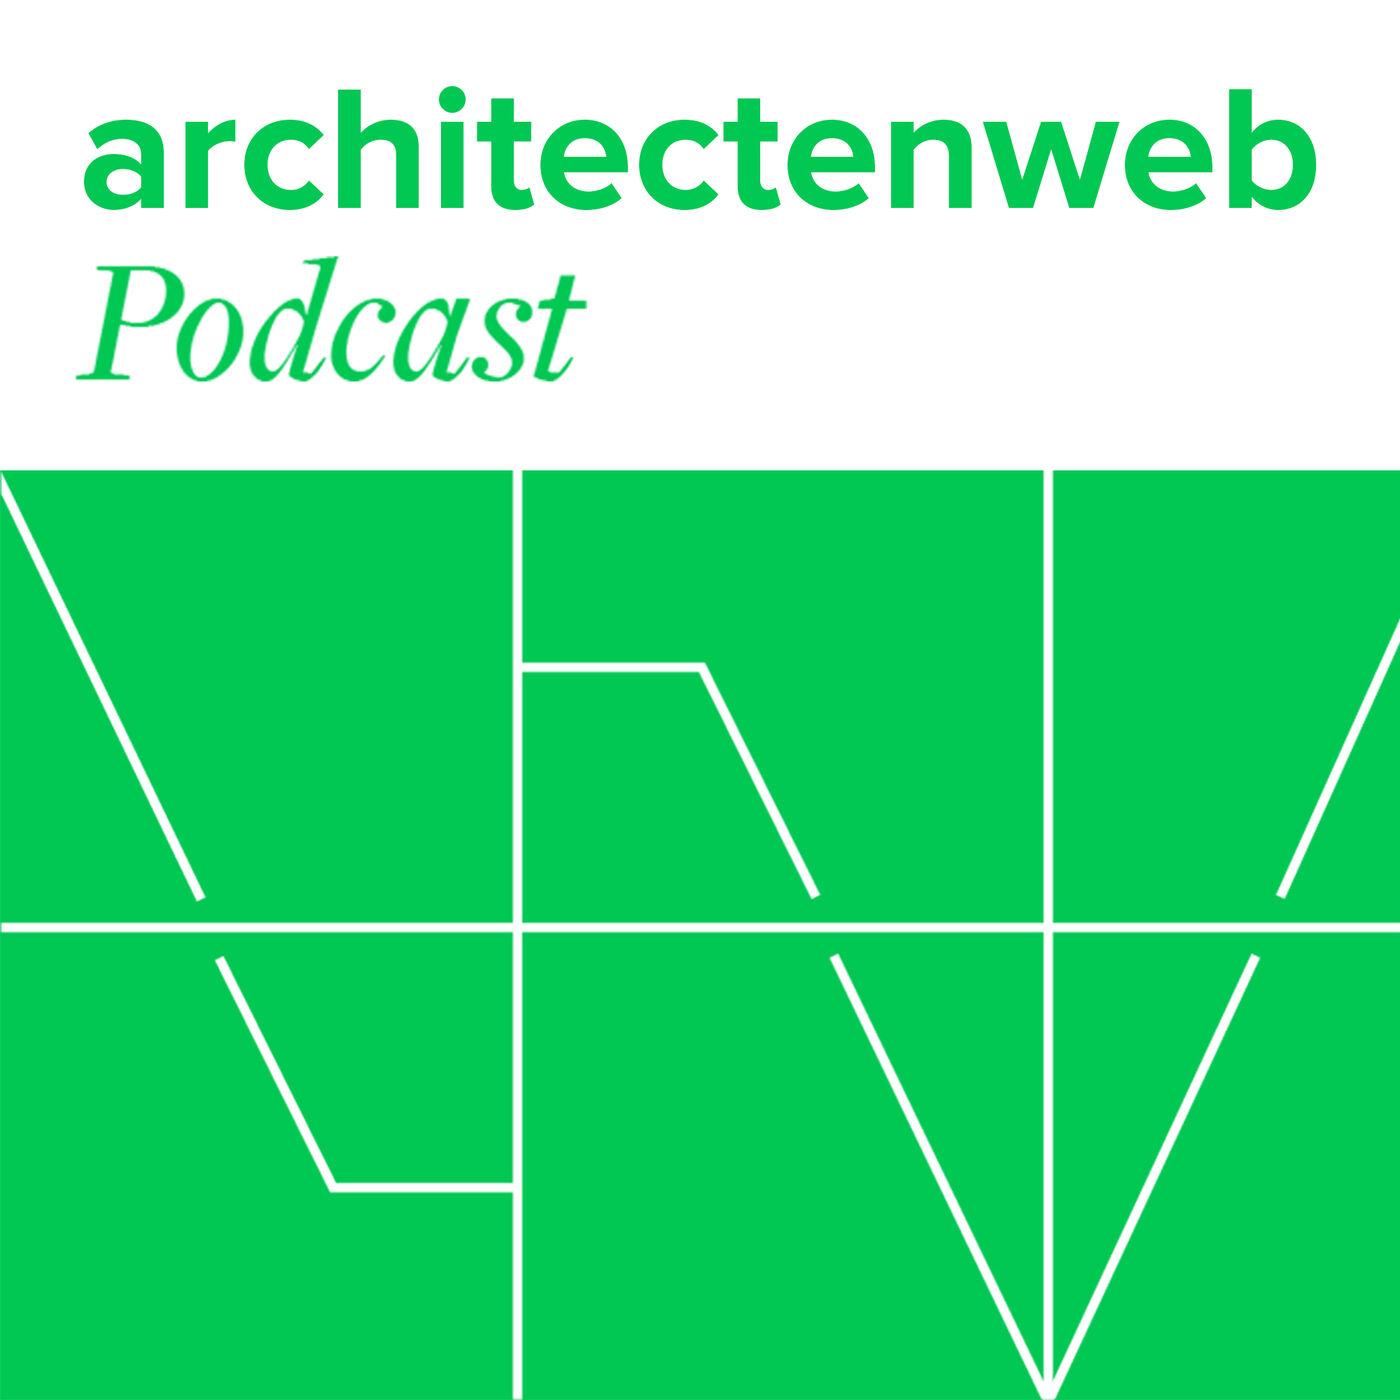 Architectenweb Podcast logo